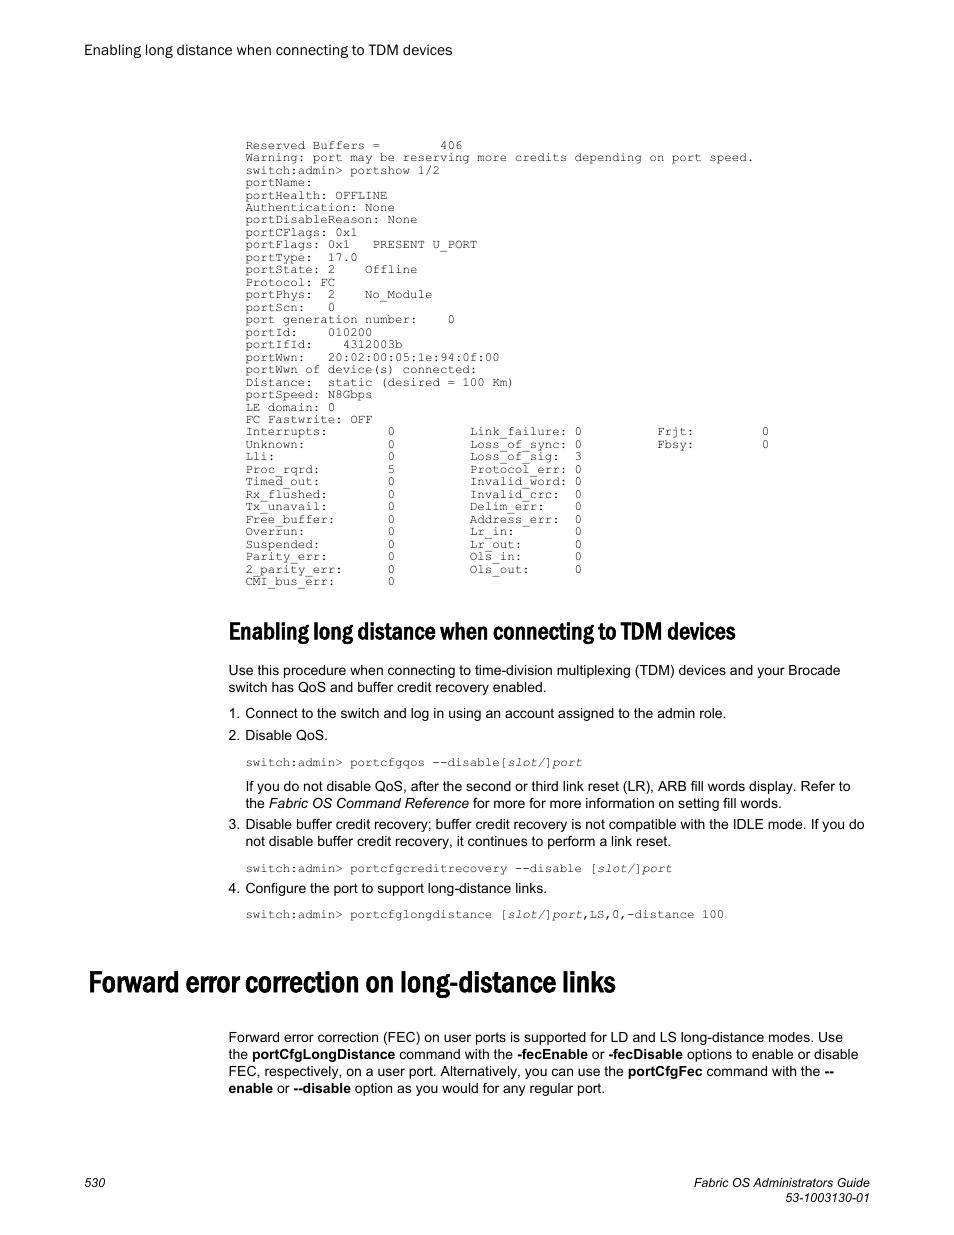 Forward error correction on long-distance links | Brocade